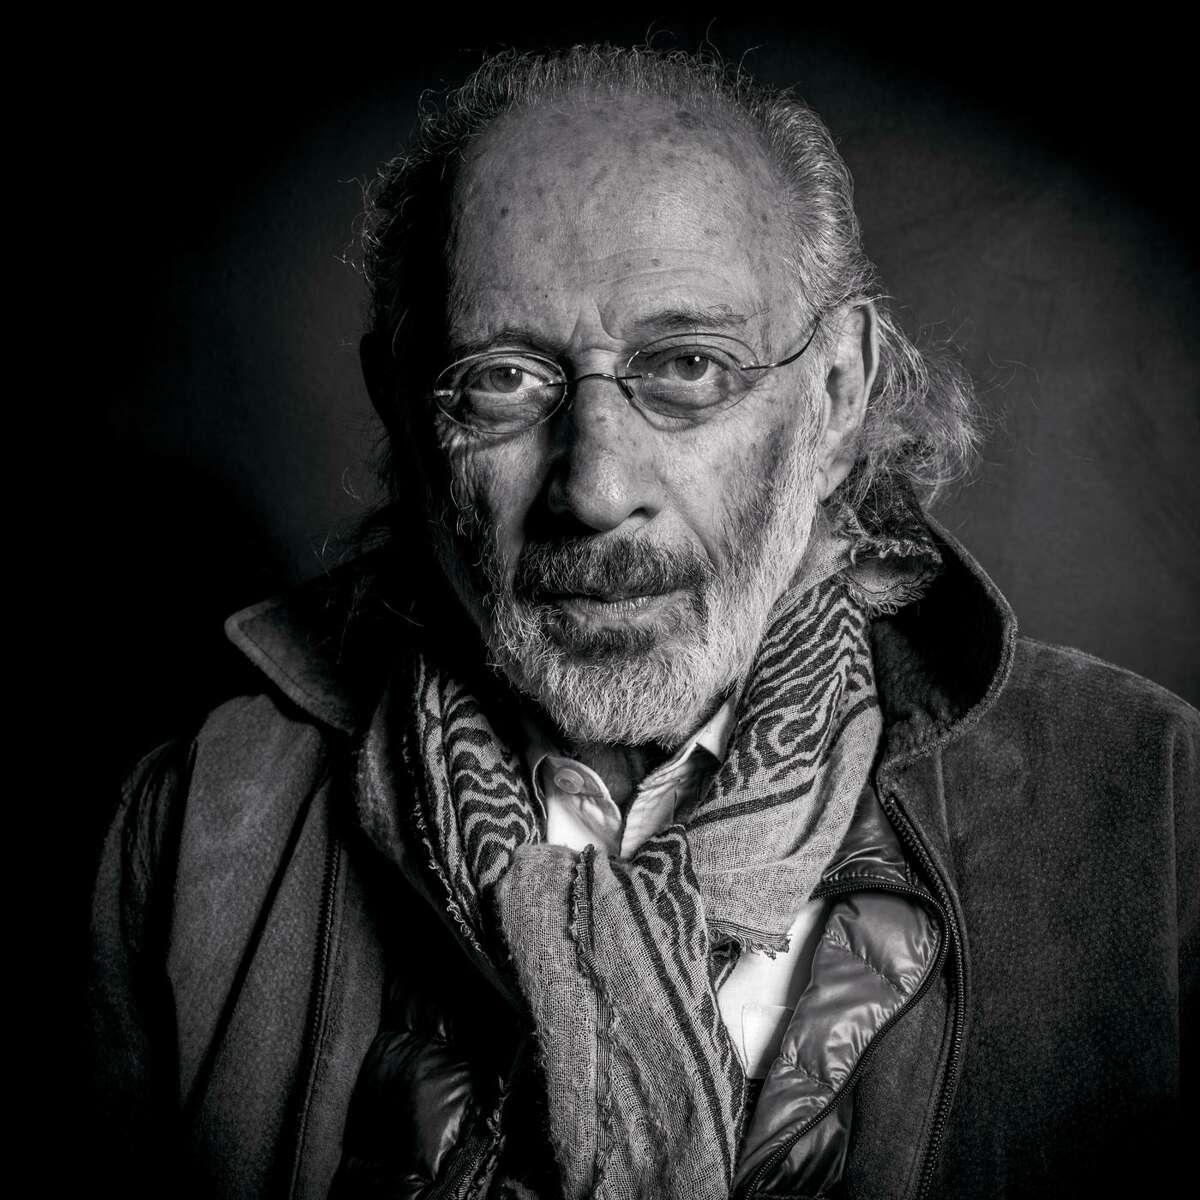 Photographer and director Jerry Schatzberg